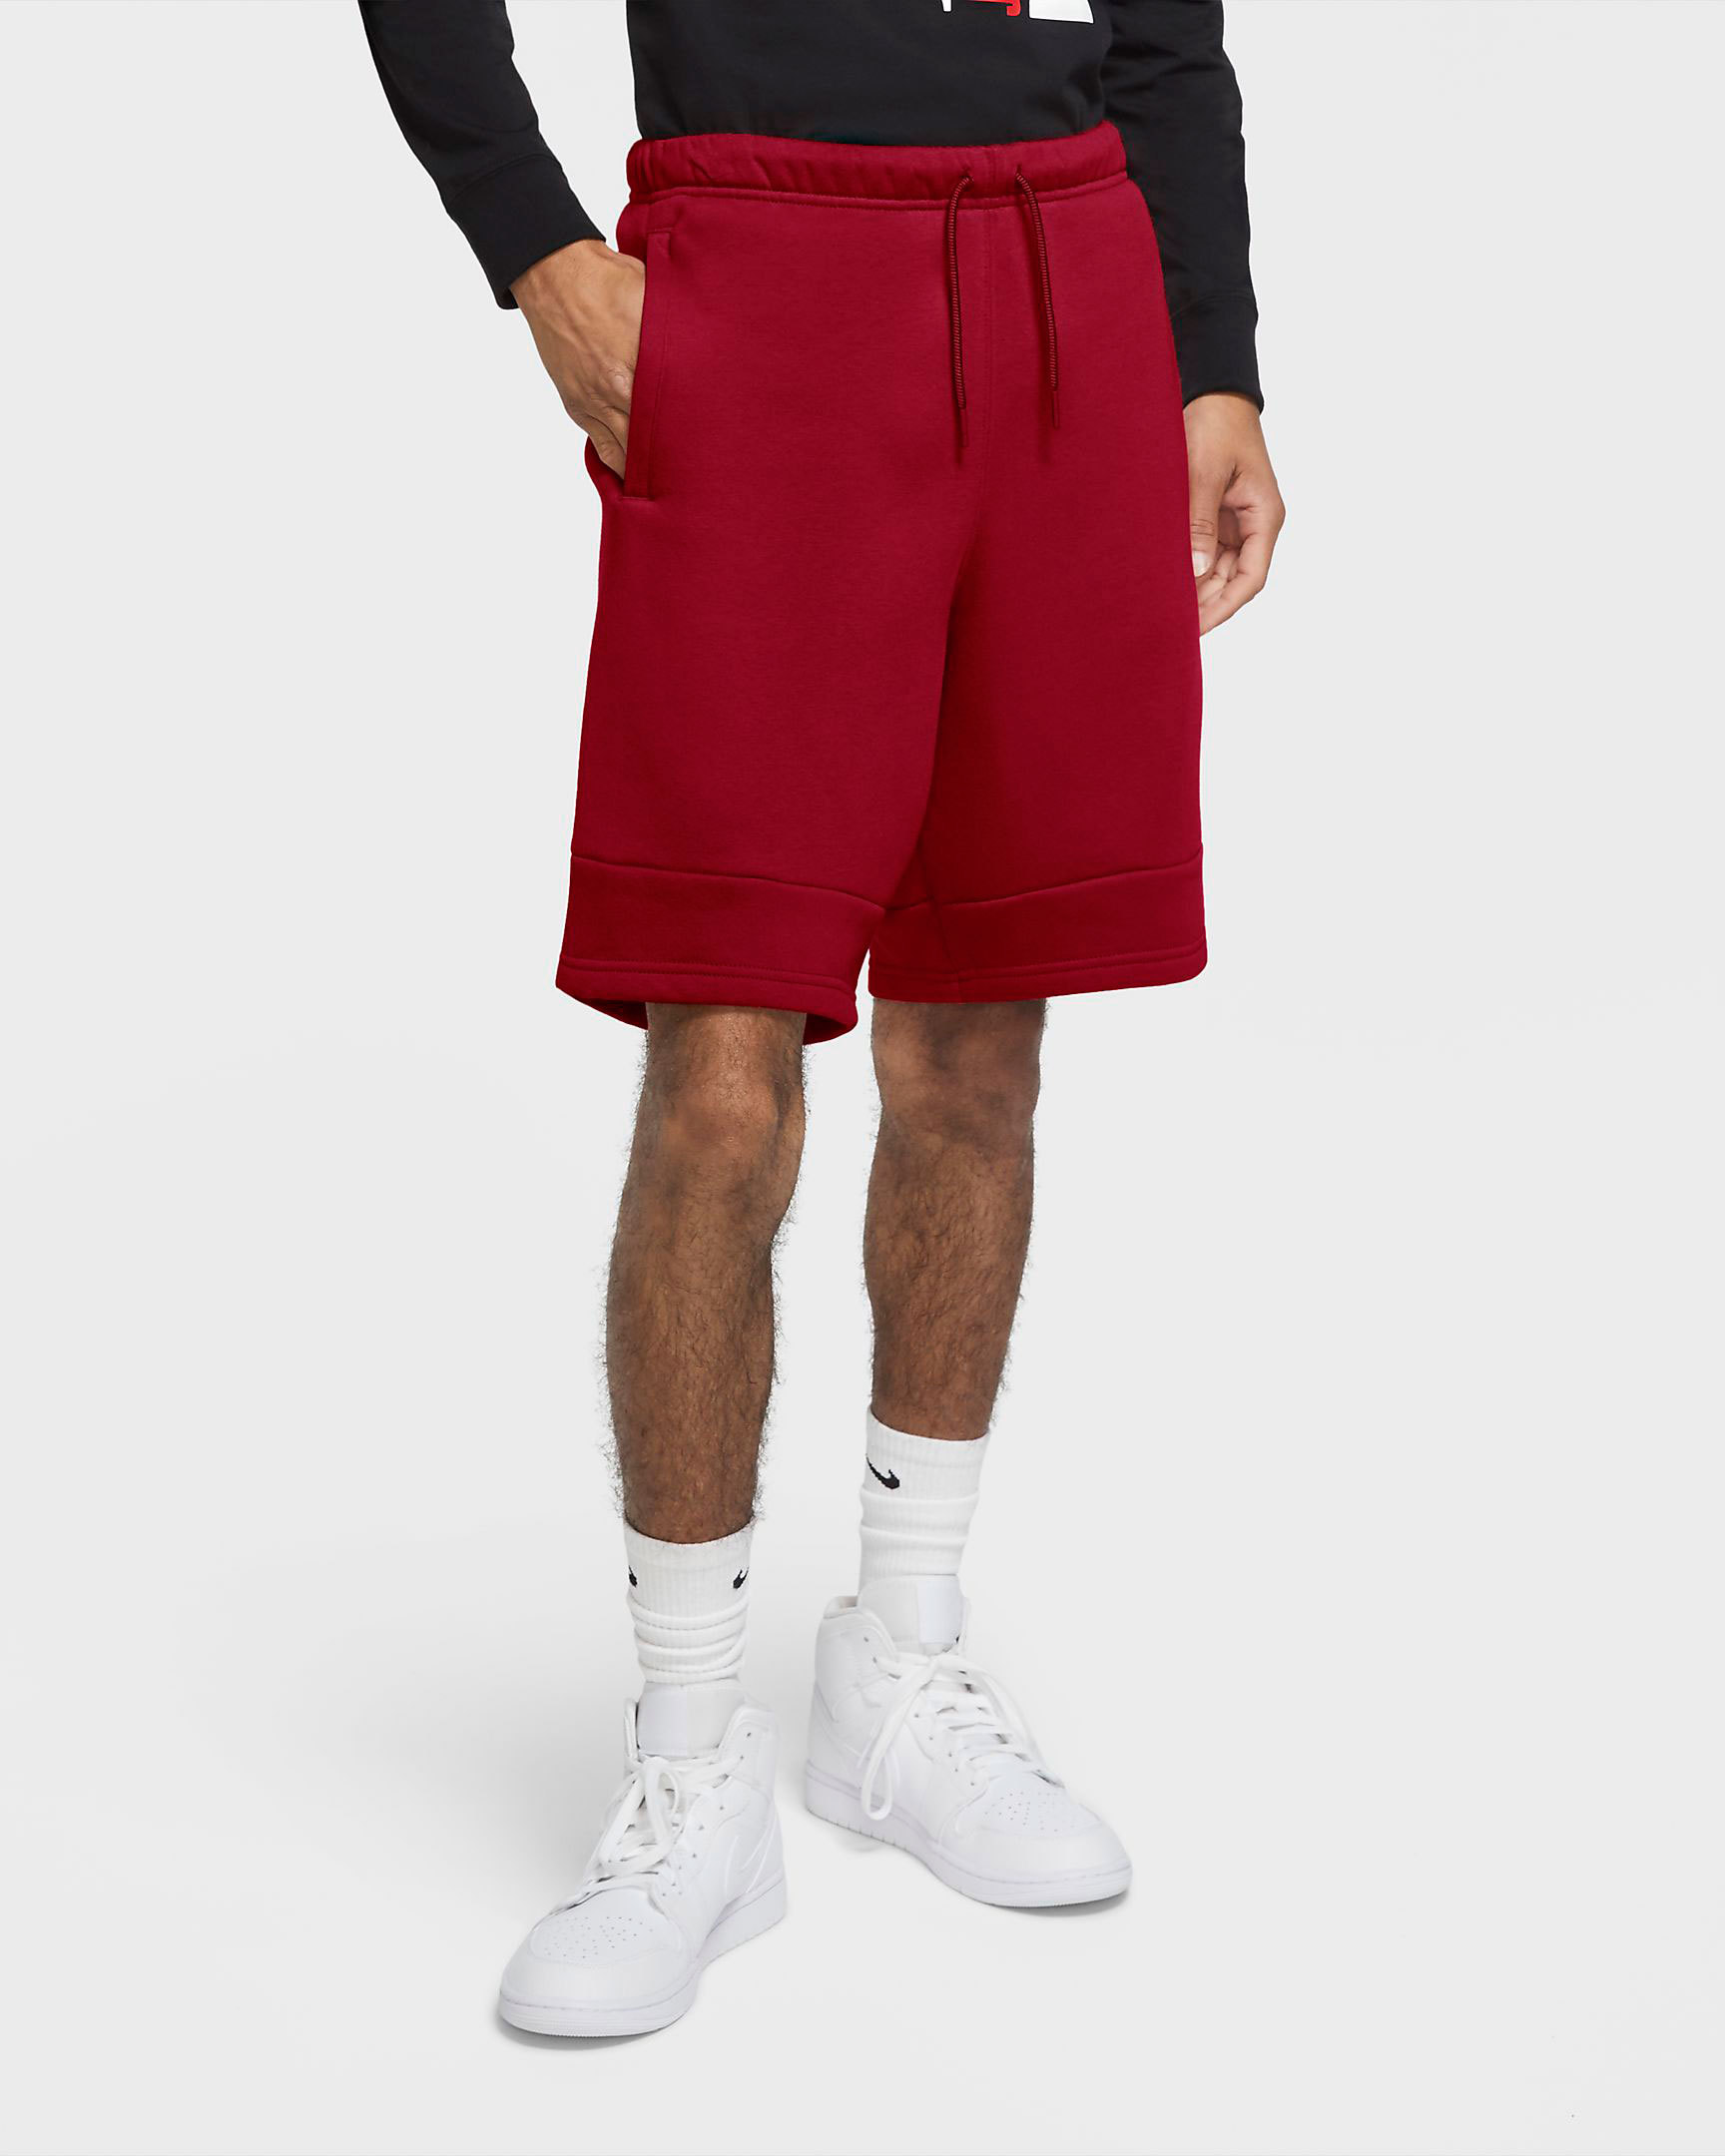 jordan-carmine-red-jumpman-fleece-shorts-1